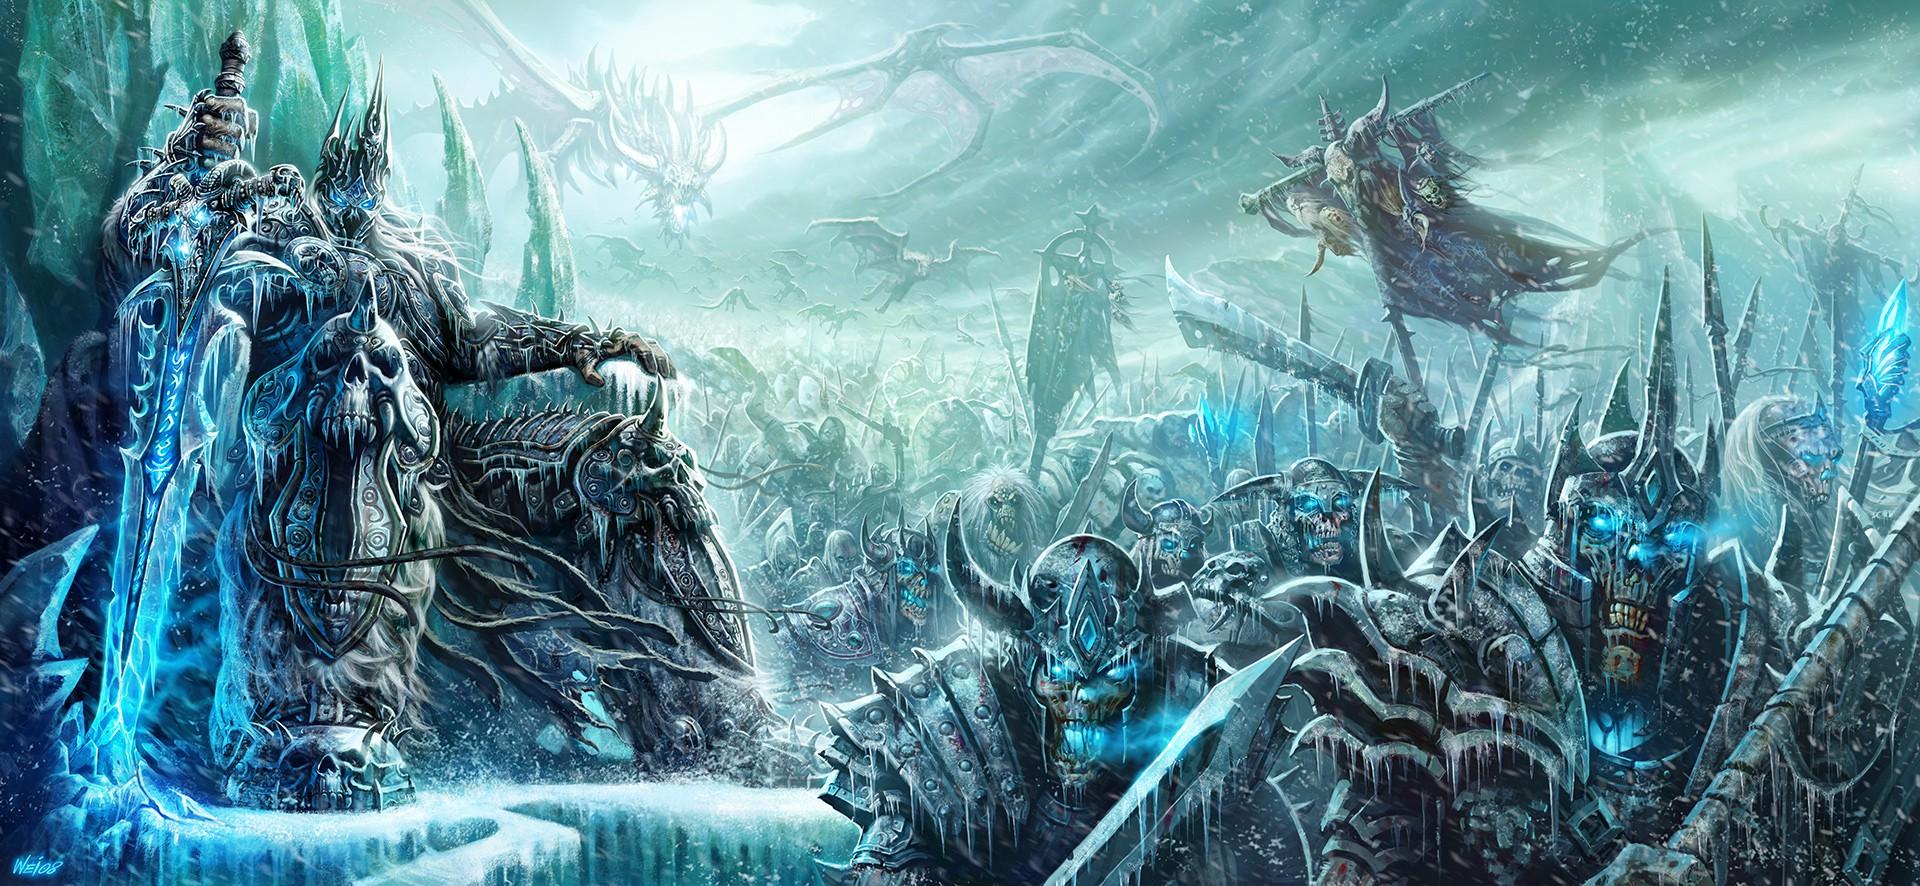 Kunstwerk The Lich King   World of Warcraft   Blizzard Entertainment   Cook  and Becker